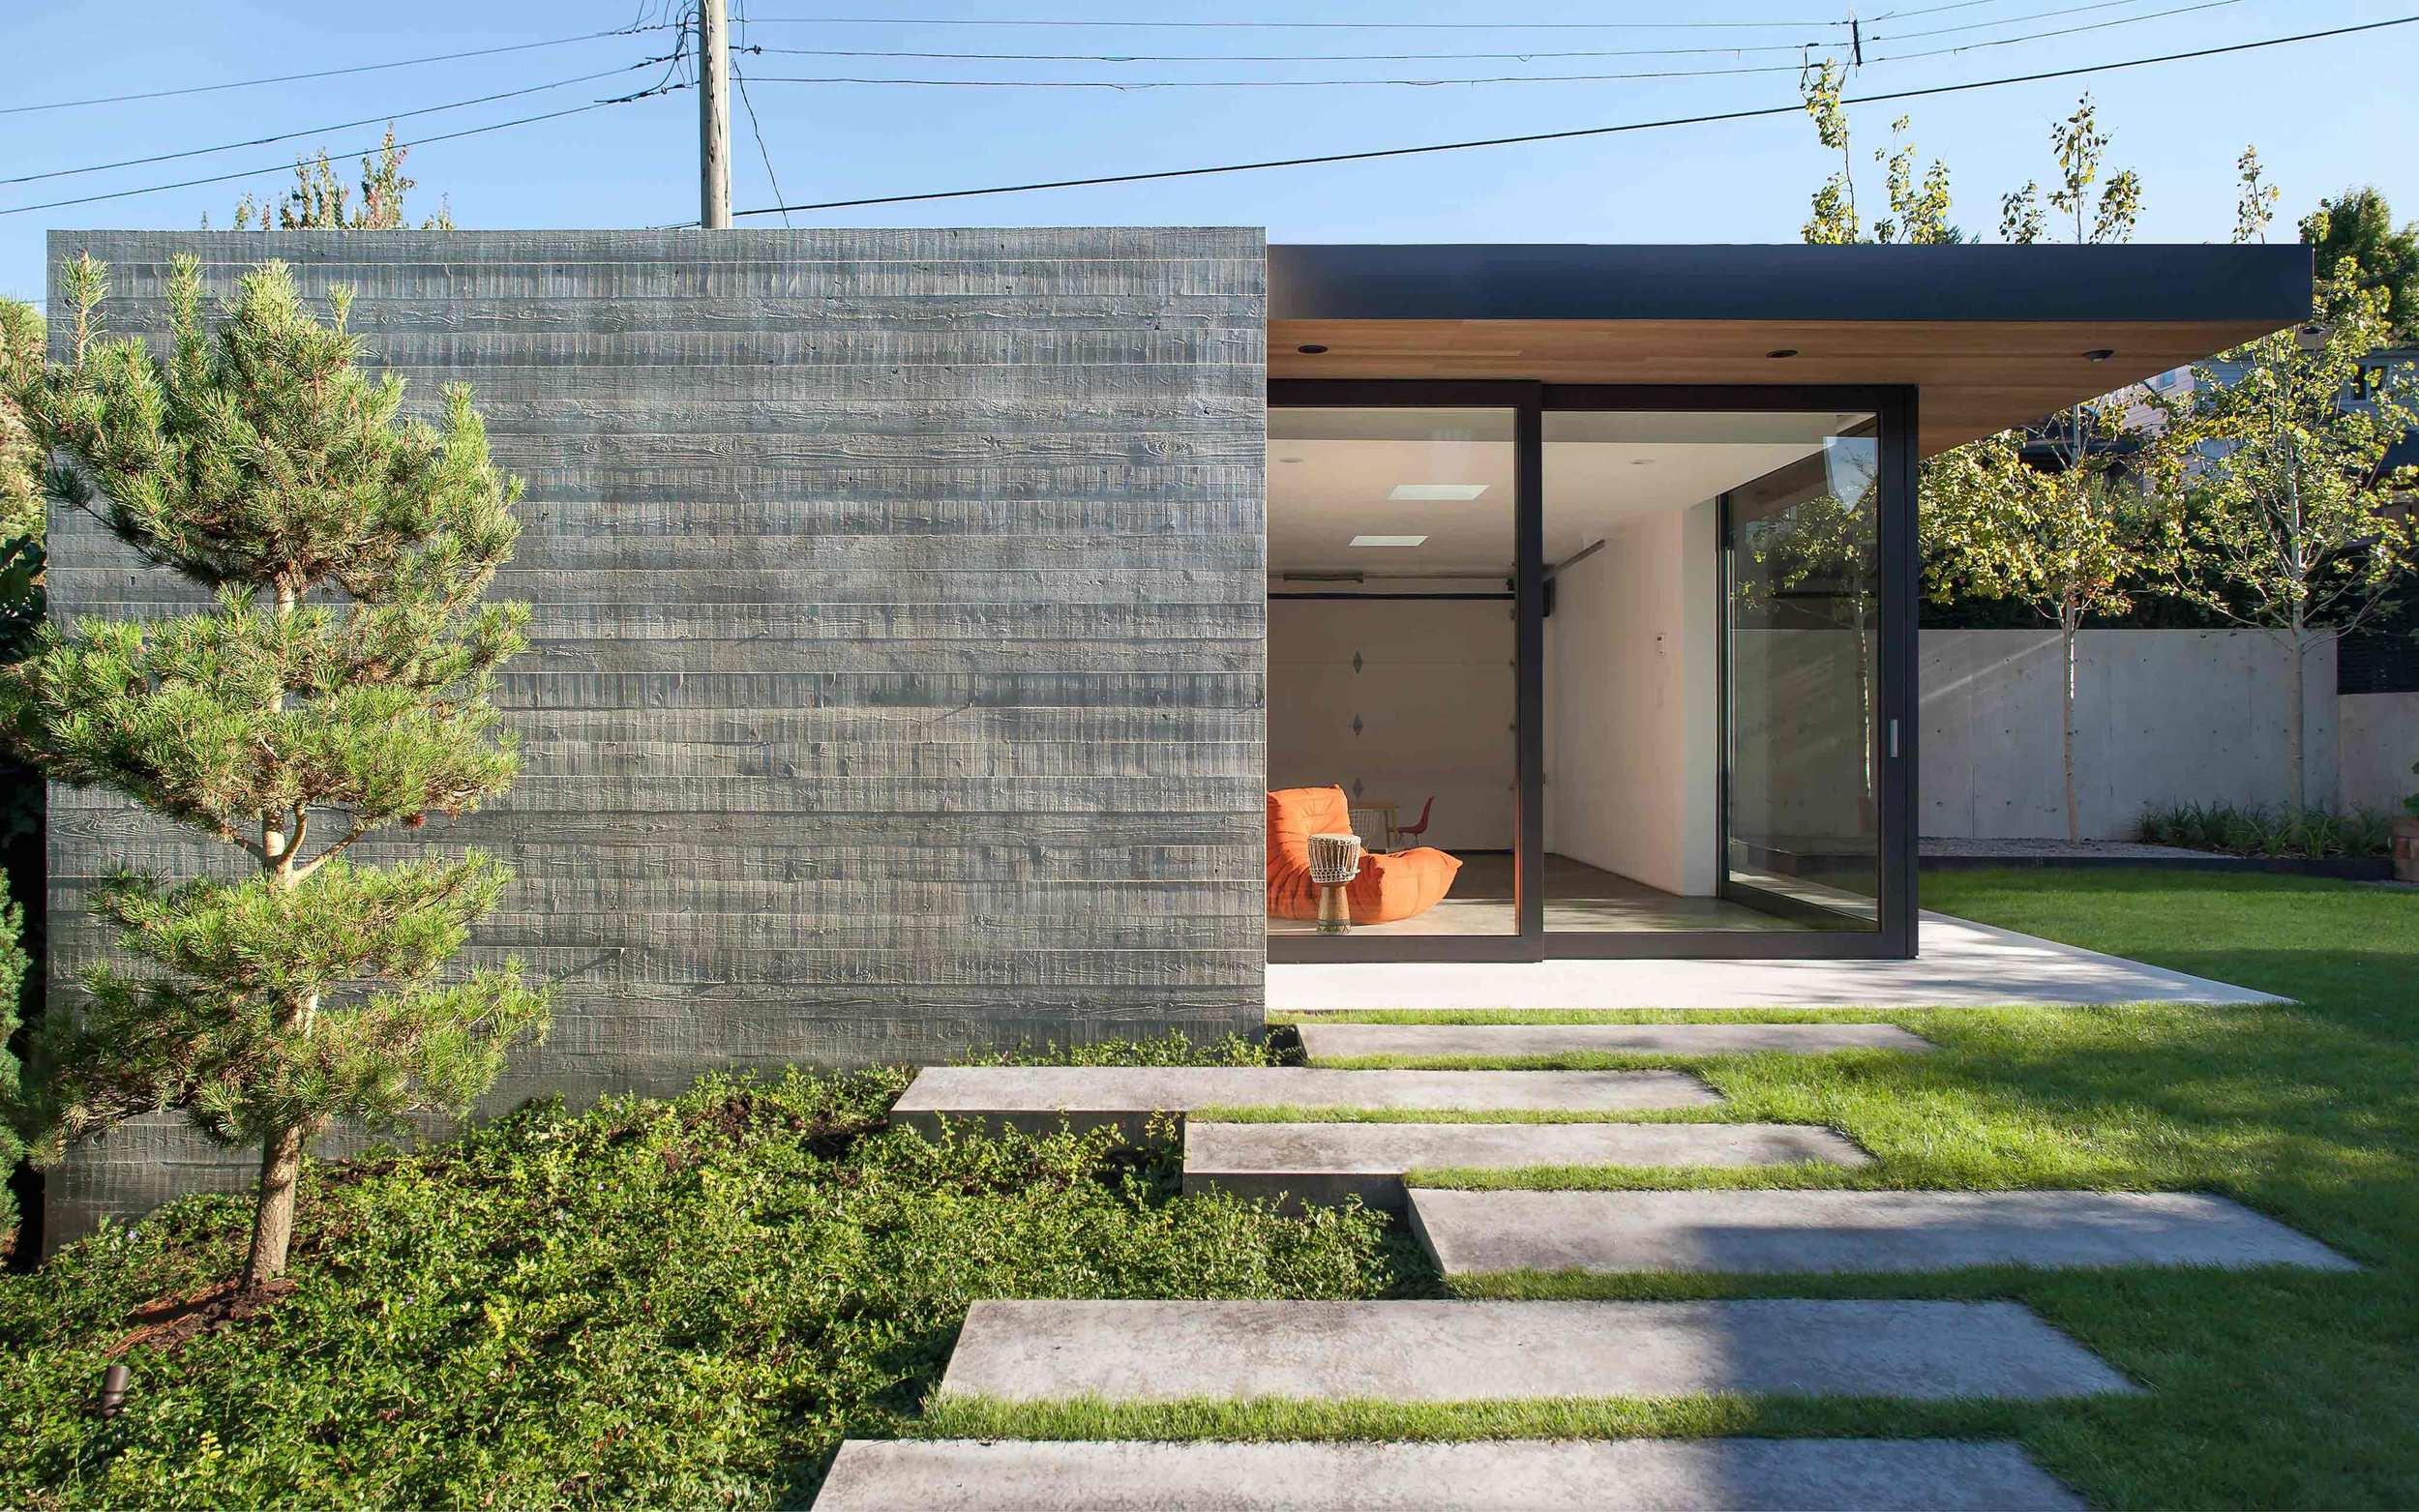 design  Splyce Design  build    Weibel Projects   photo   Sama Jim Canzian